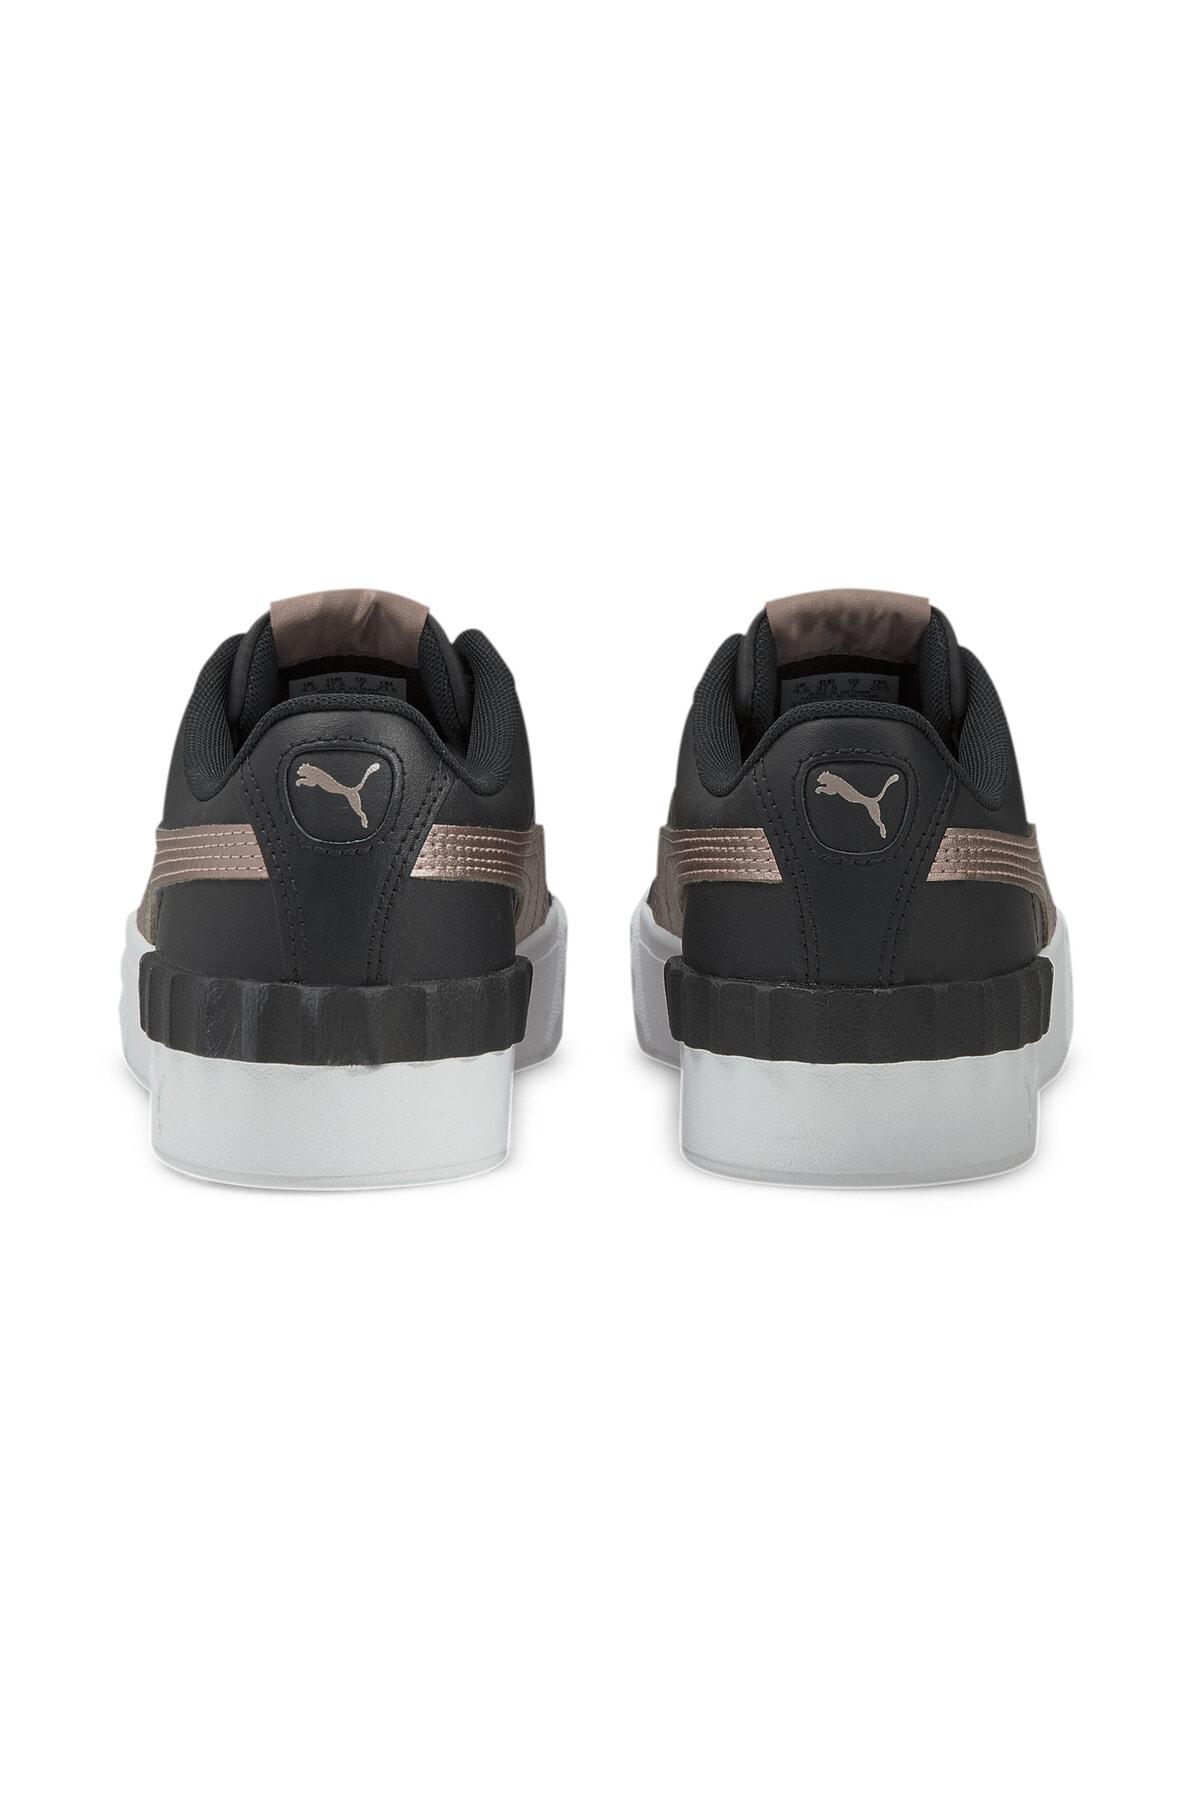 Puma Kadın Sneaker - CARINA LIFT METALLIC - 37599502 2